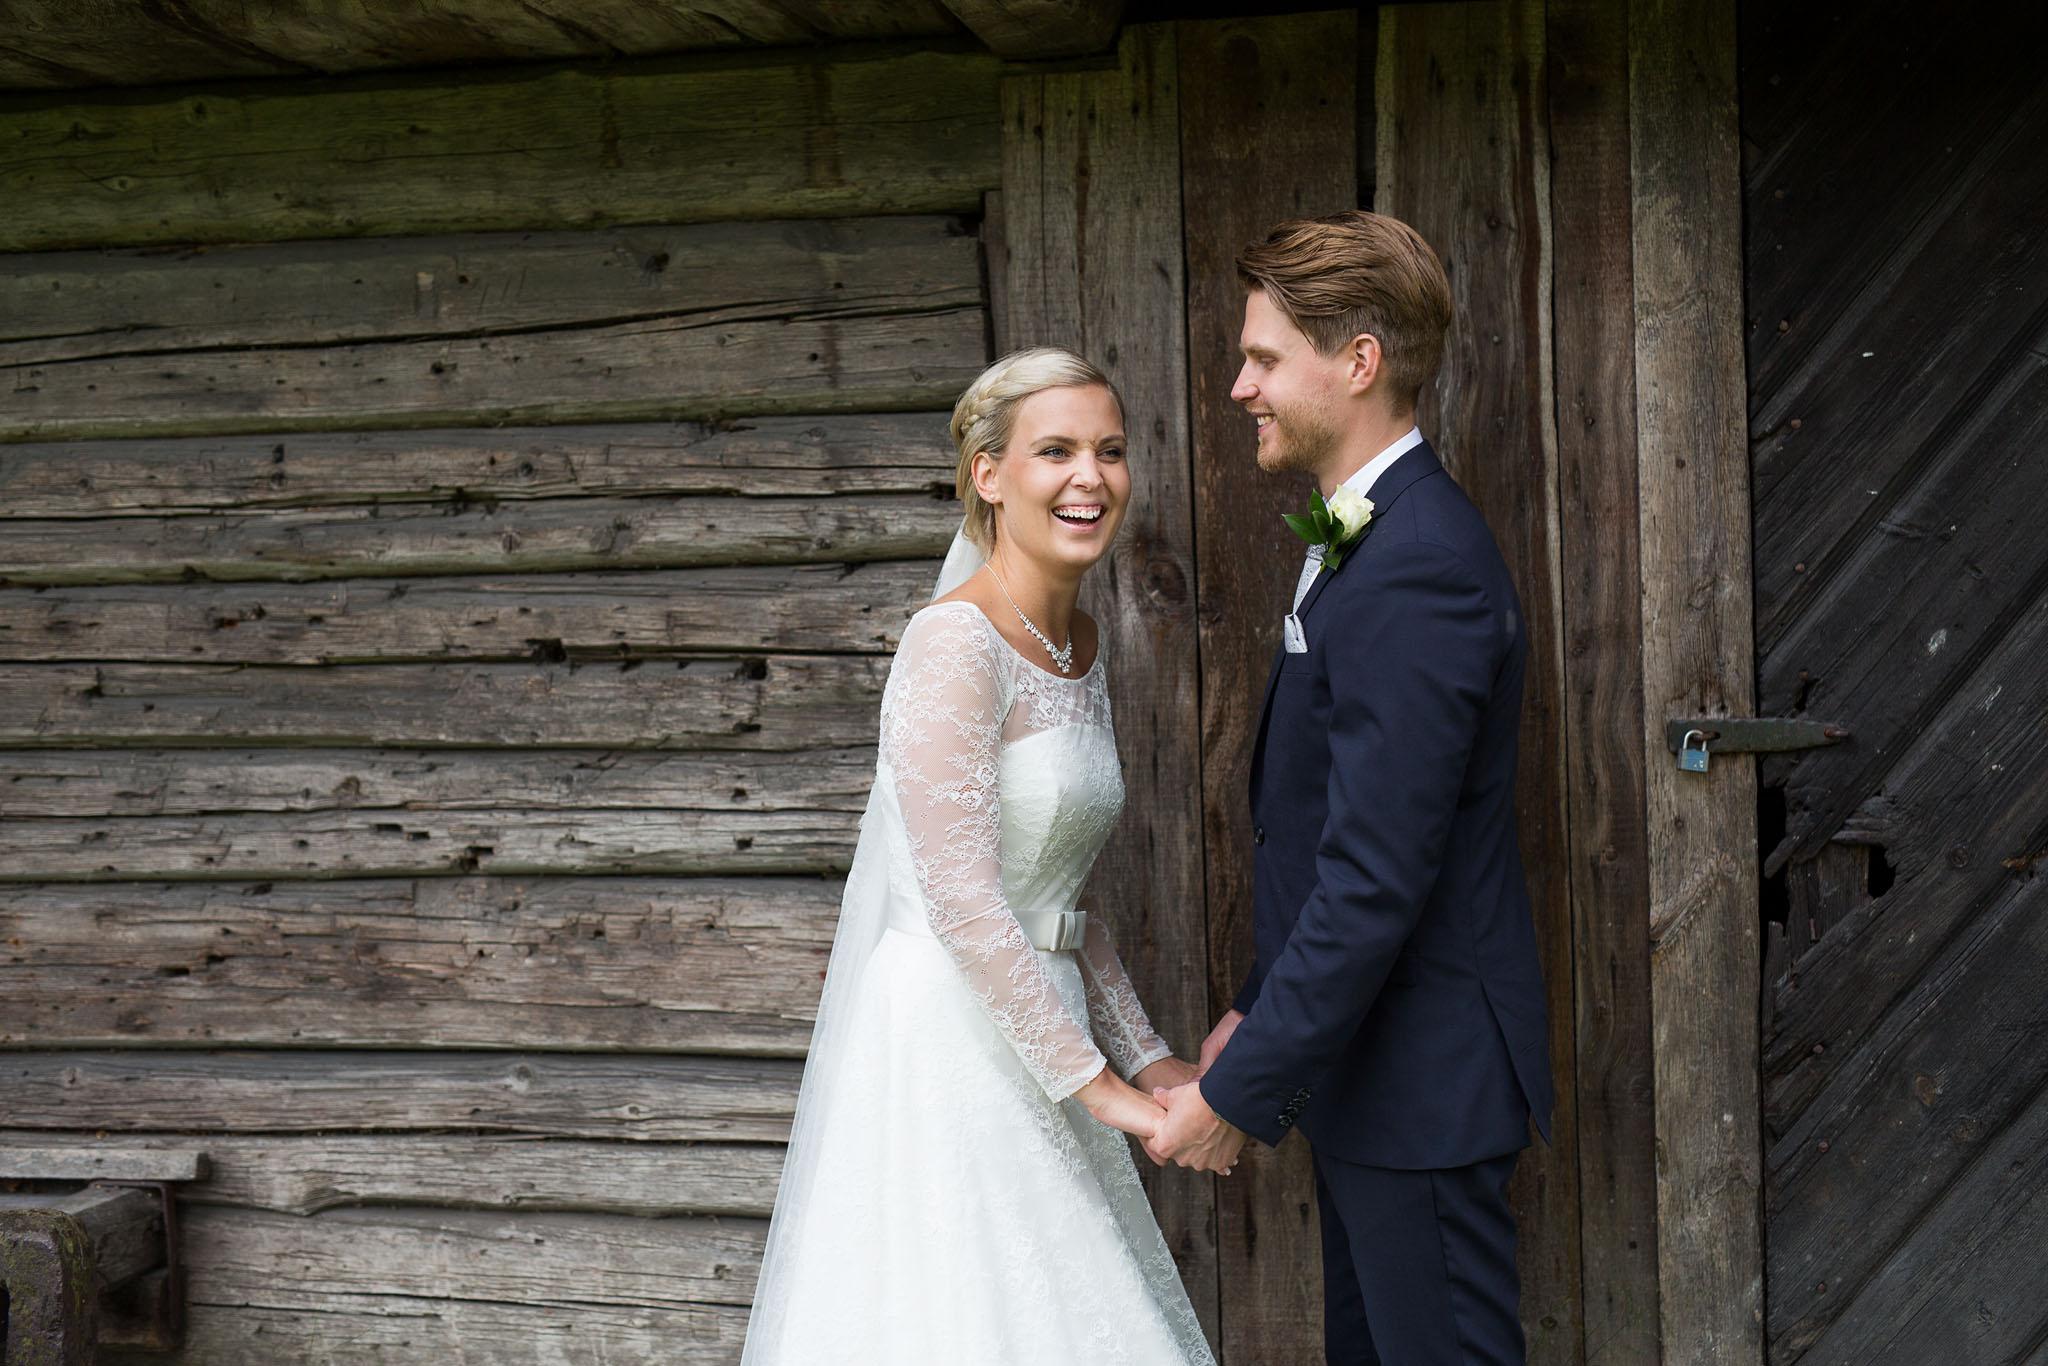 fotograf sabina wixner hudiksvall bröllop 26.jpg